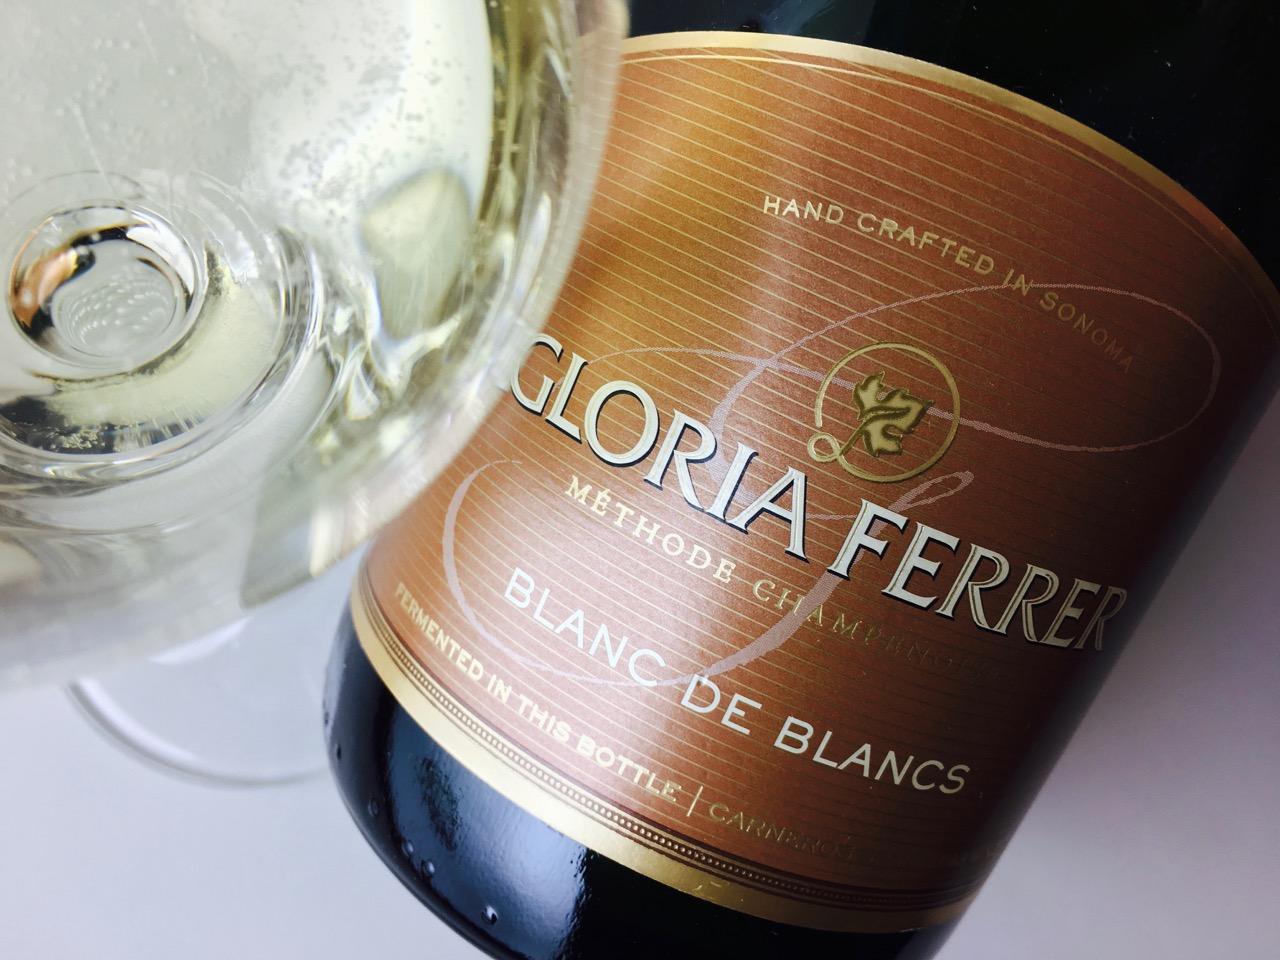 NV Gloria Ferrer Blanc de Blancs Carneros